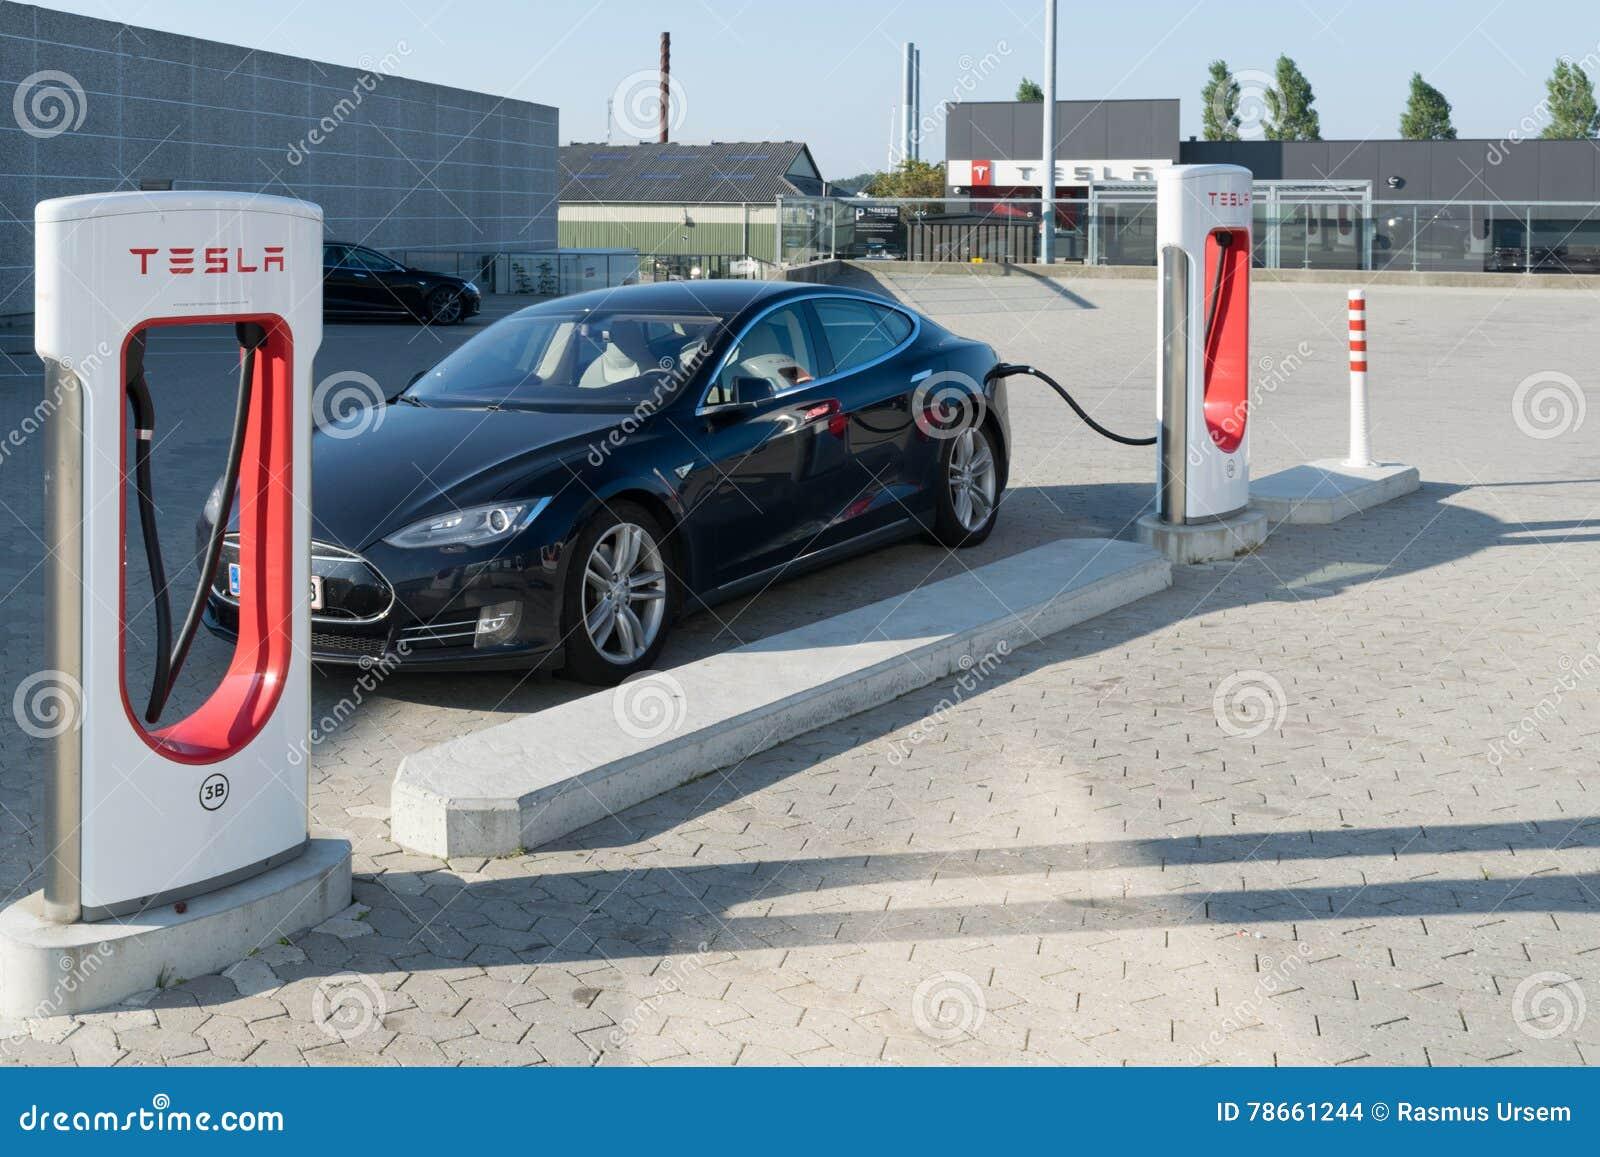 Aarhus, Dinamarca - 14 de setembro de 2016: Carro de Tesla que está sendo carregado em